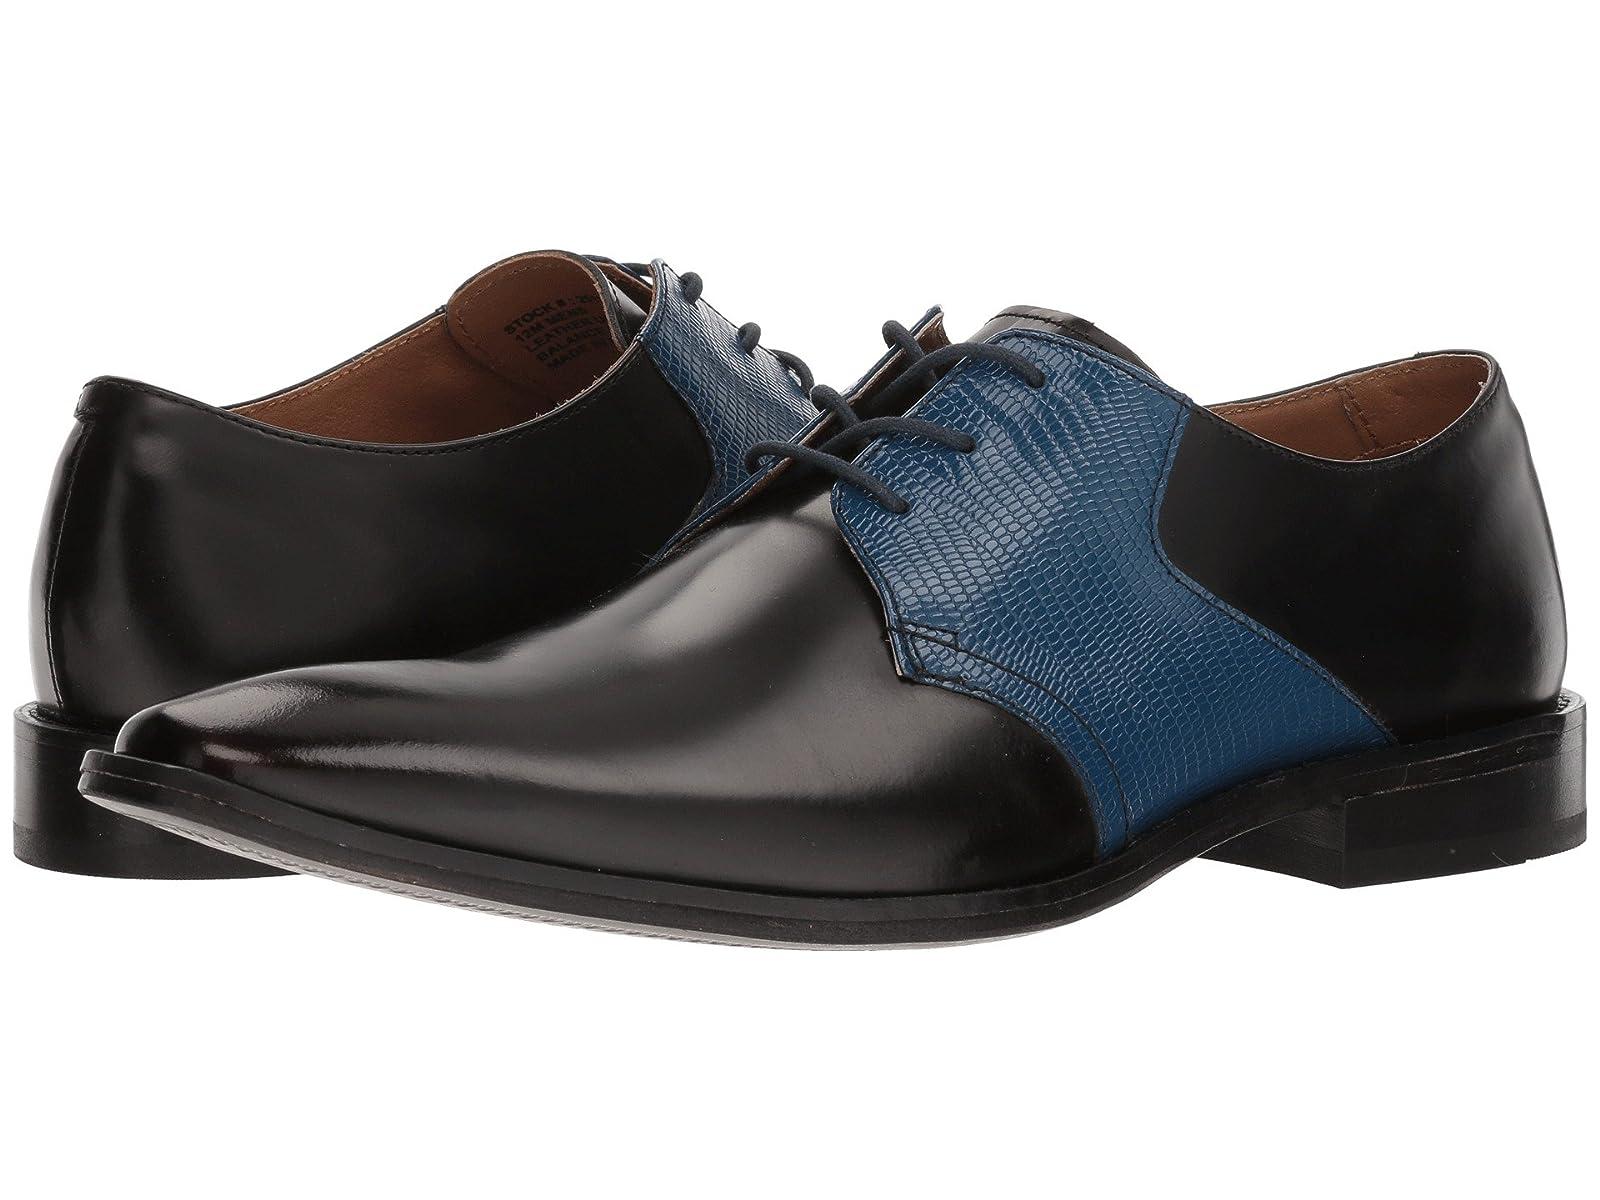 Giorgio Brutini GothamAtmospheric grades have affordable shoes